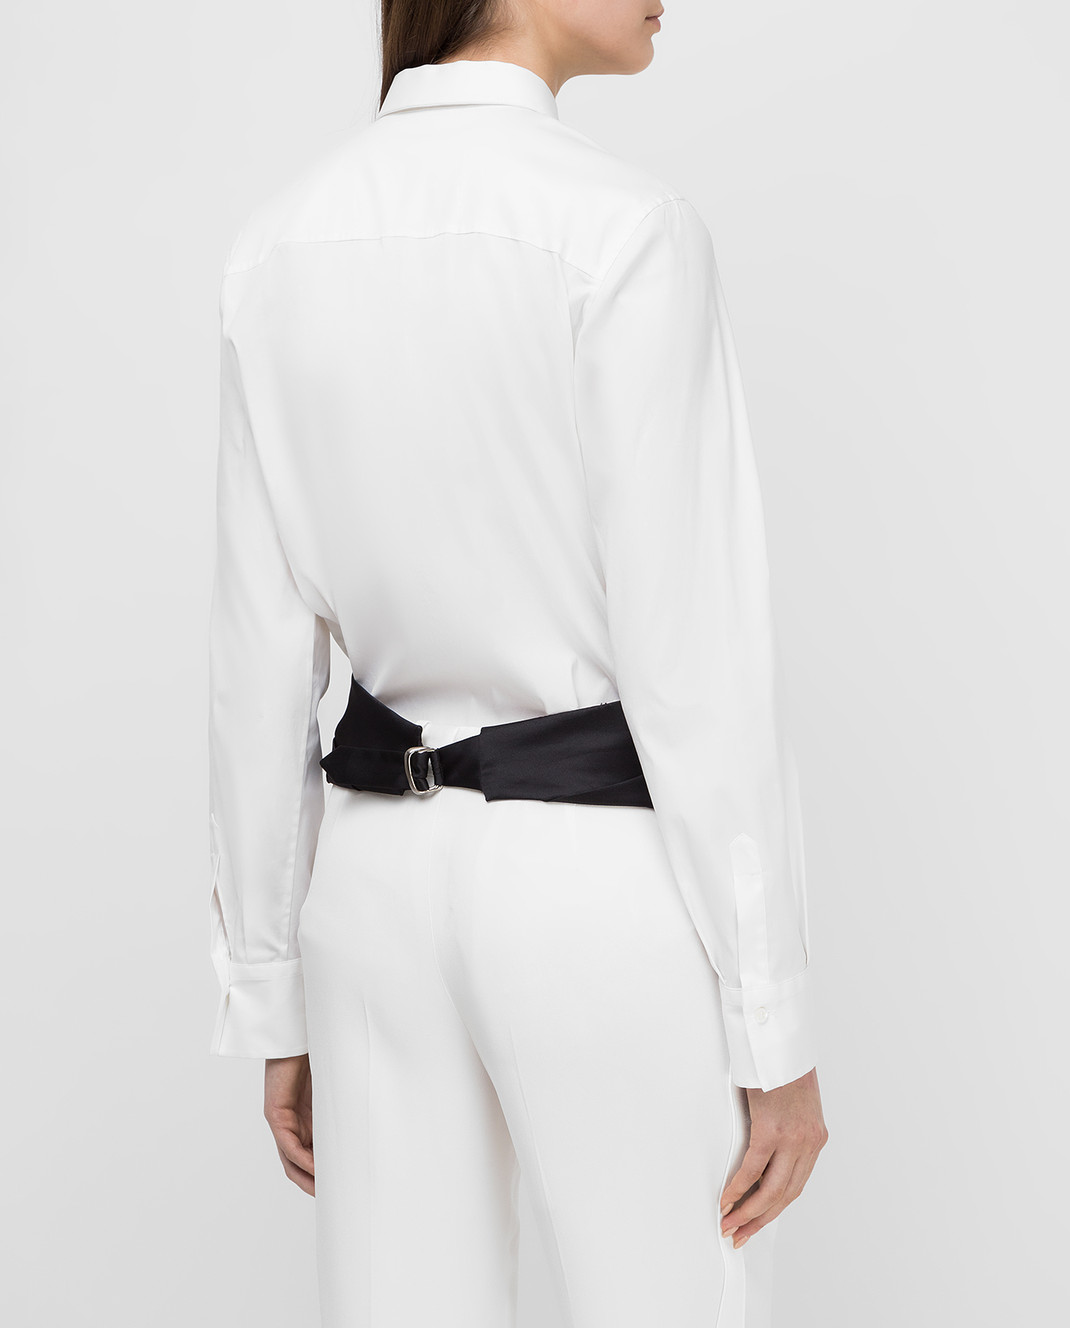 Brunello Cucinelli Белая рубашка M0091M6215 изображение 4